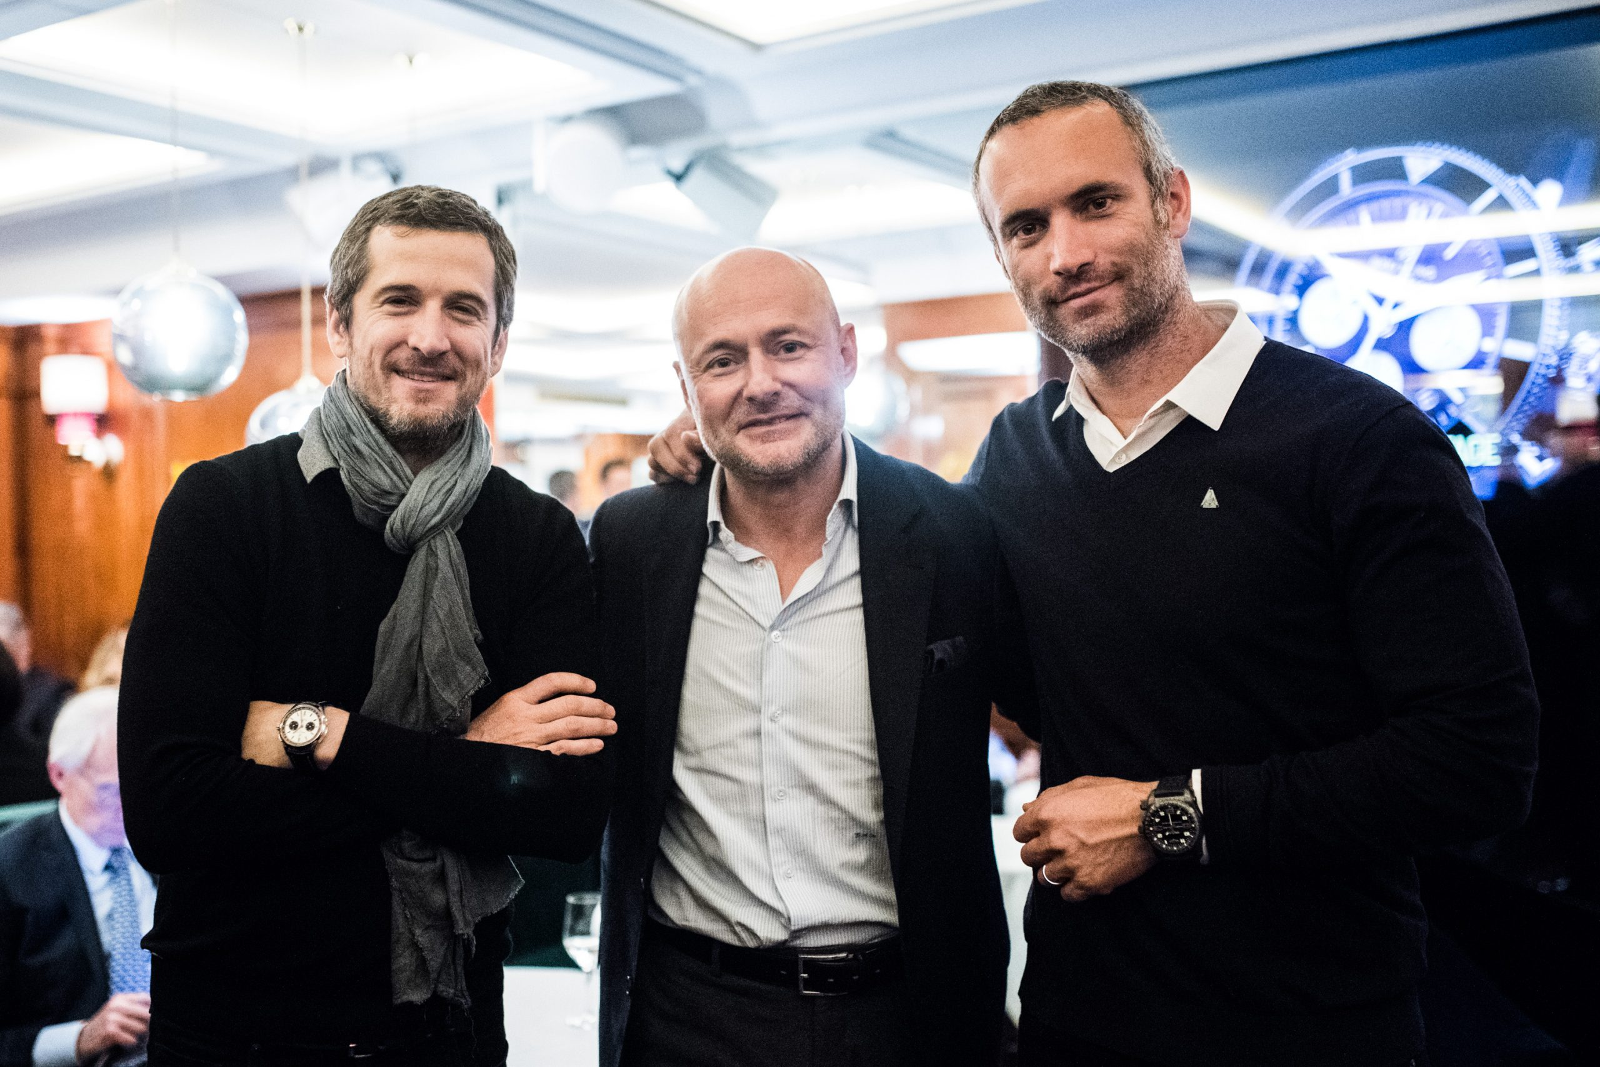 Guillaume Canet - Fabrice Amedeo, Georges Kern, Breitling Montre - Caroline Bleux Photographe Paris